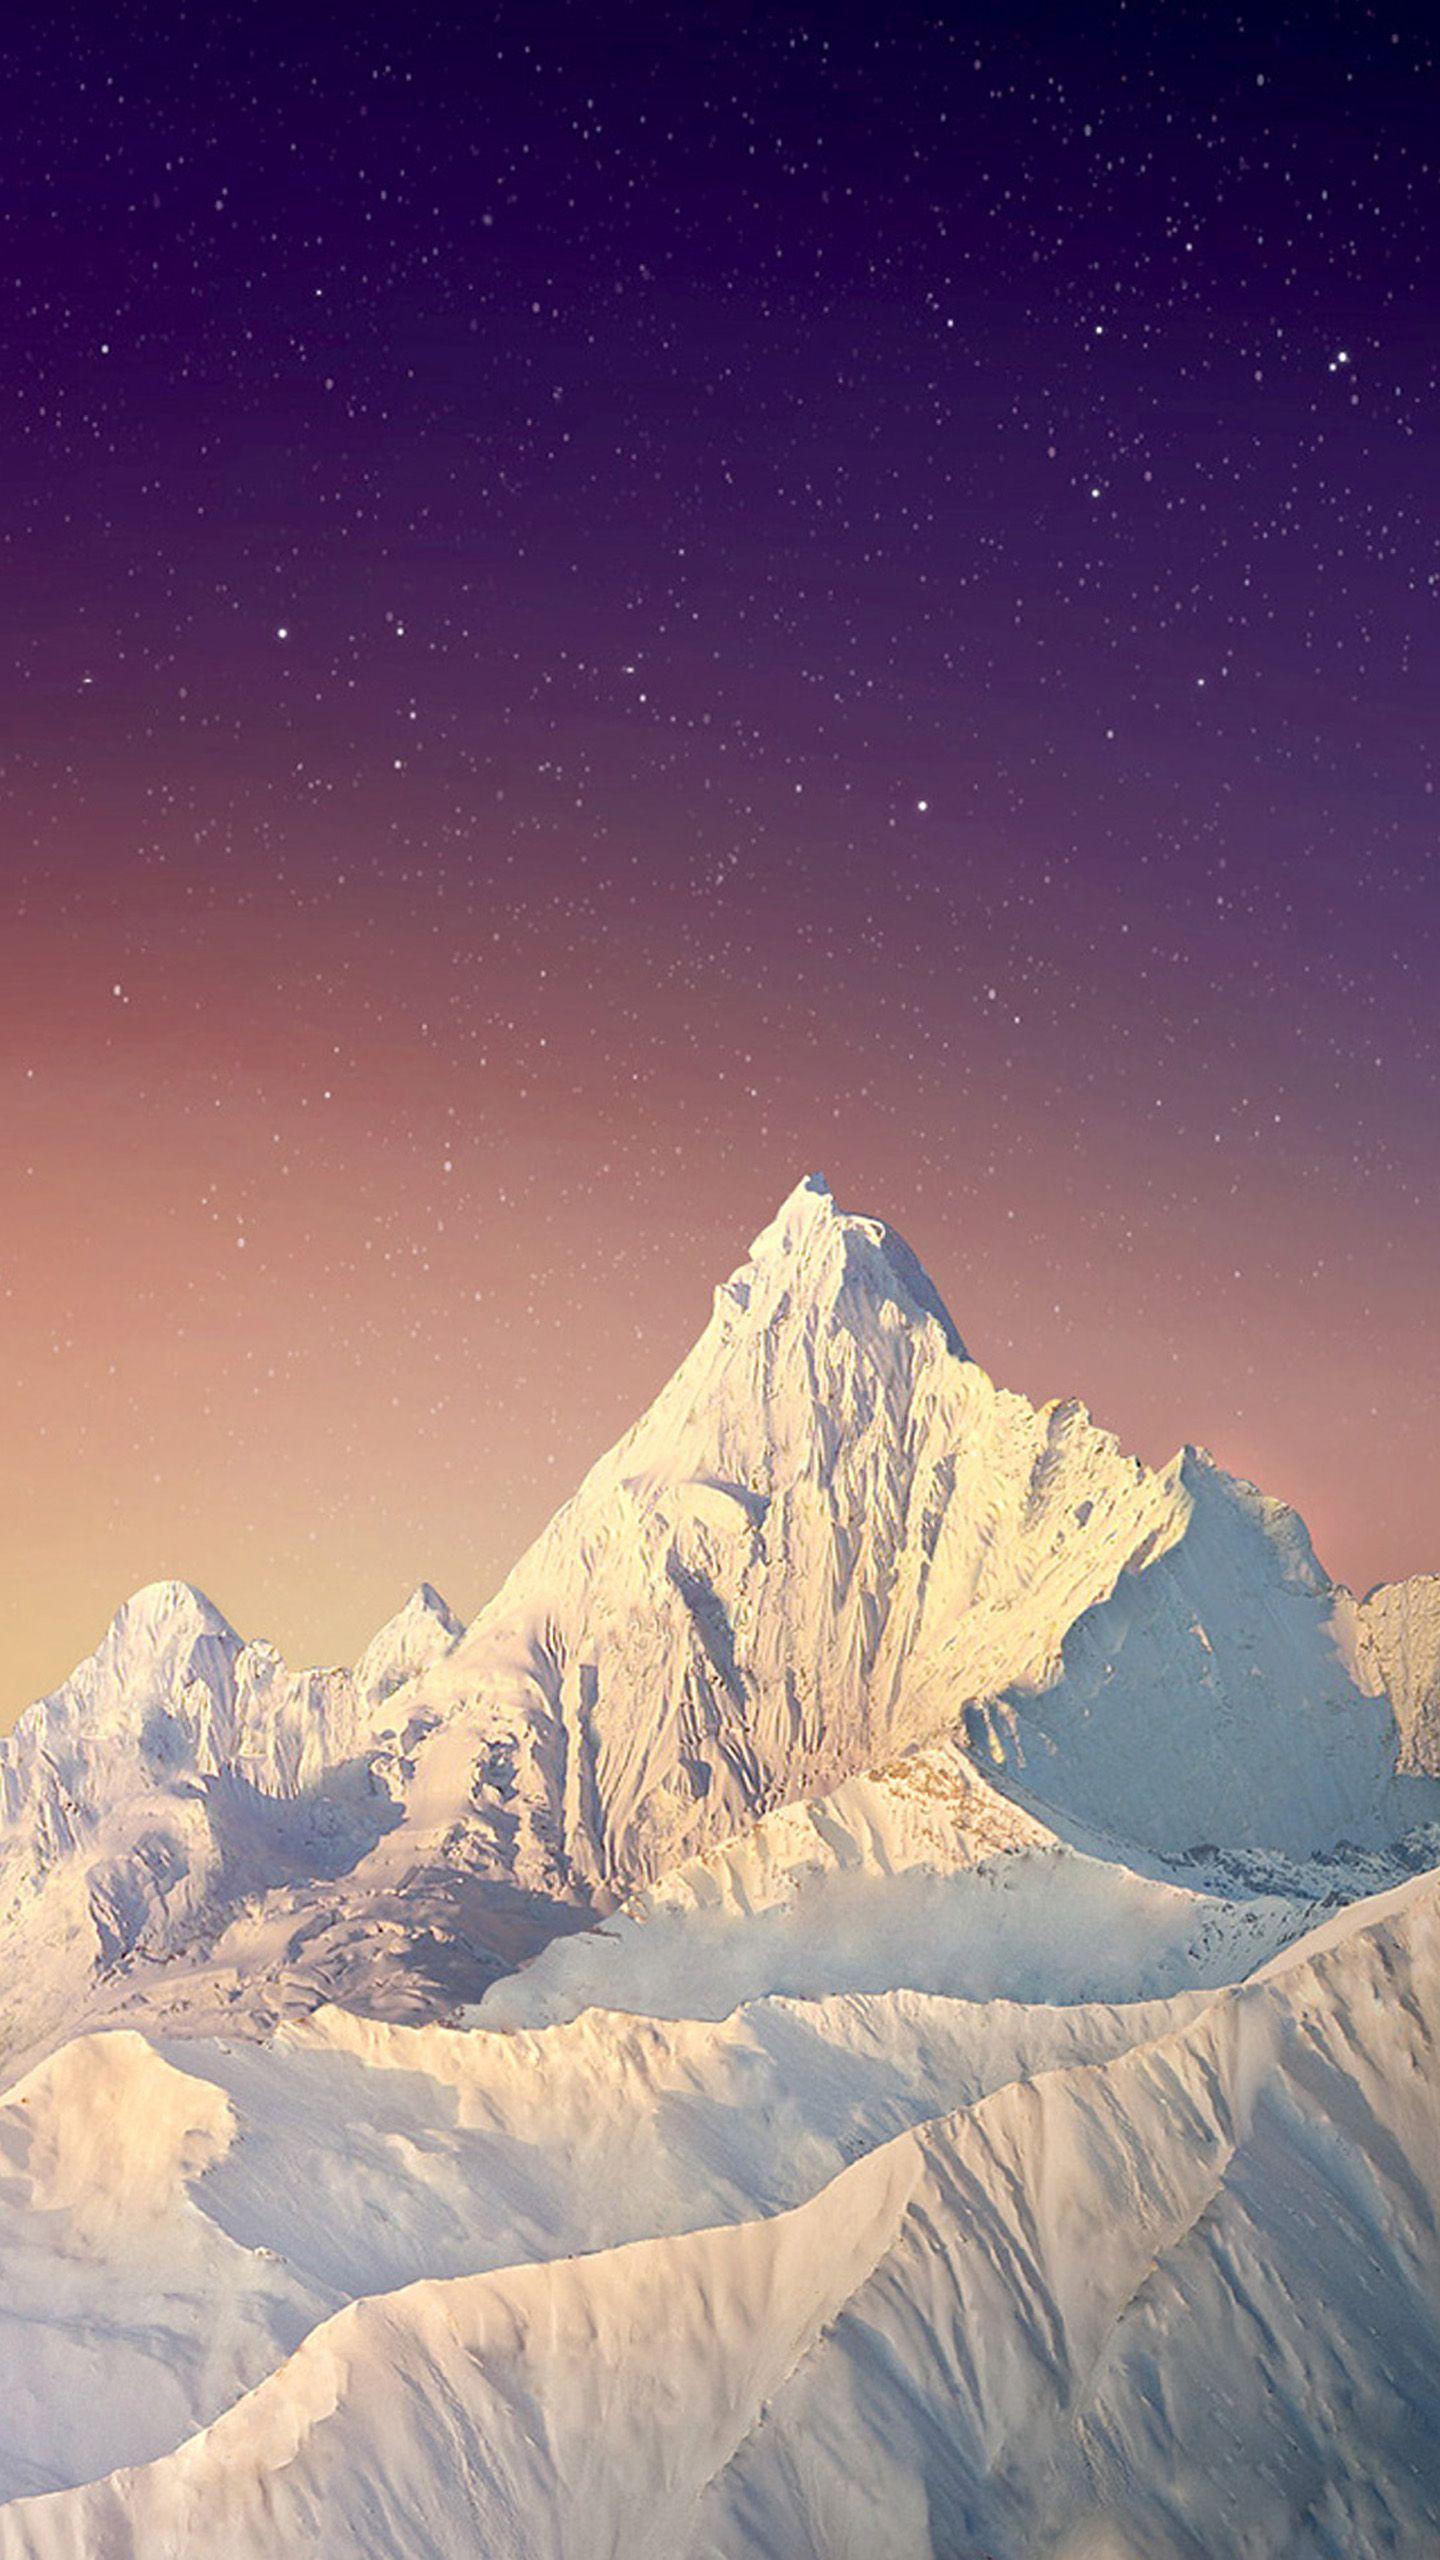 Simple Wallpaper Mountain Simple - 1dff3b0d7fe5457ba878f2ffd145c327  Collection_52448.jpg